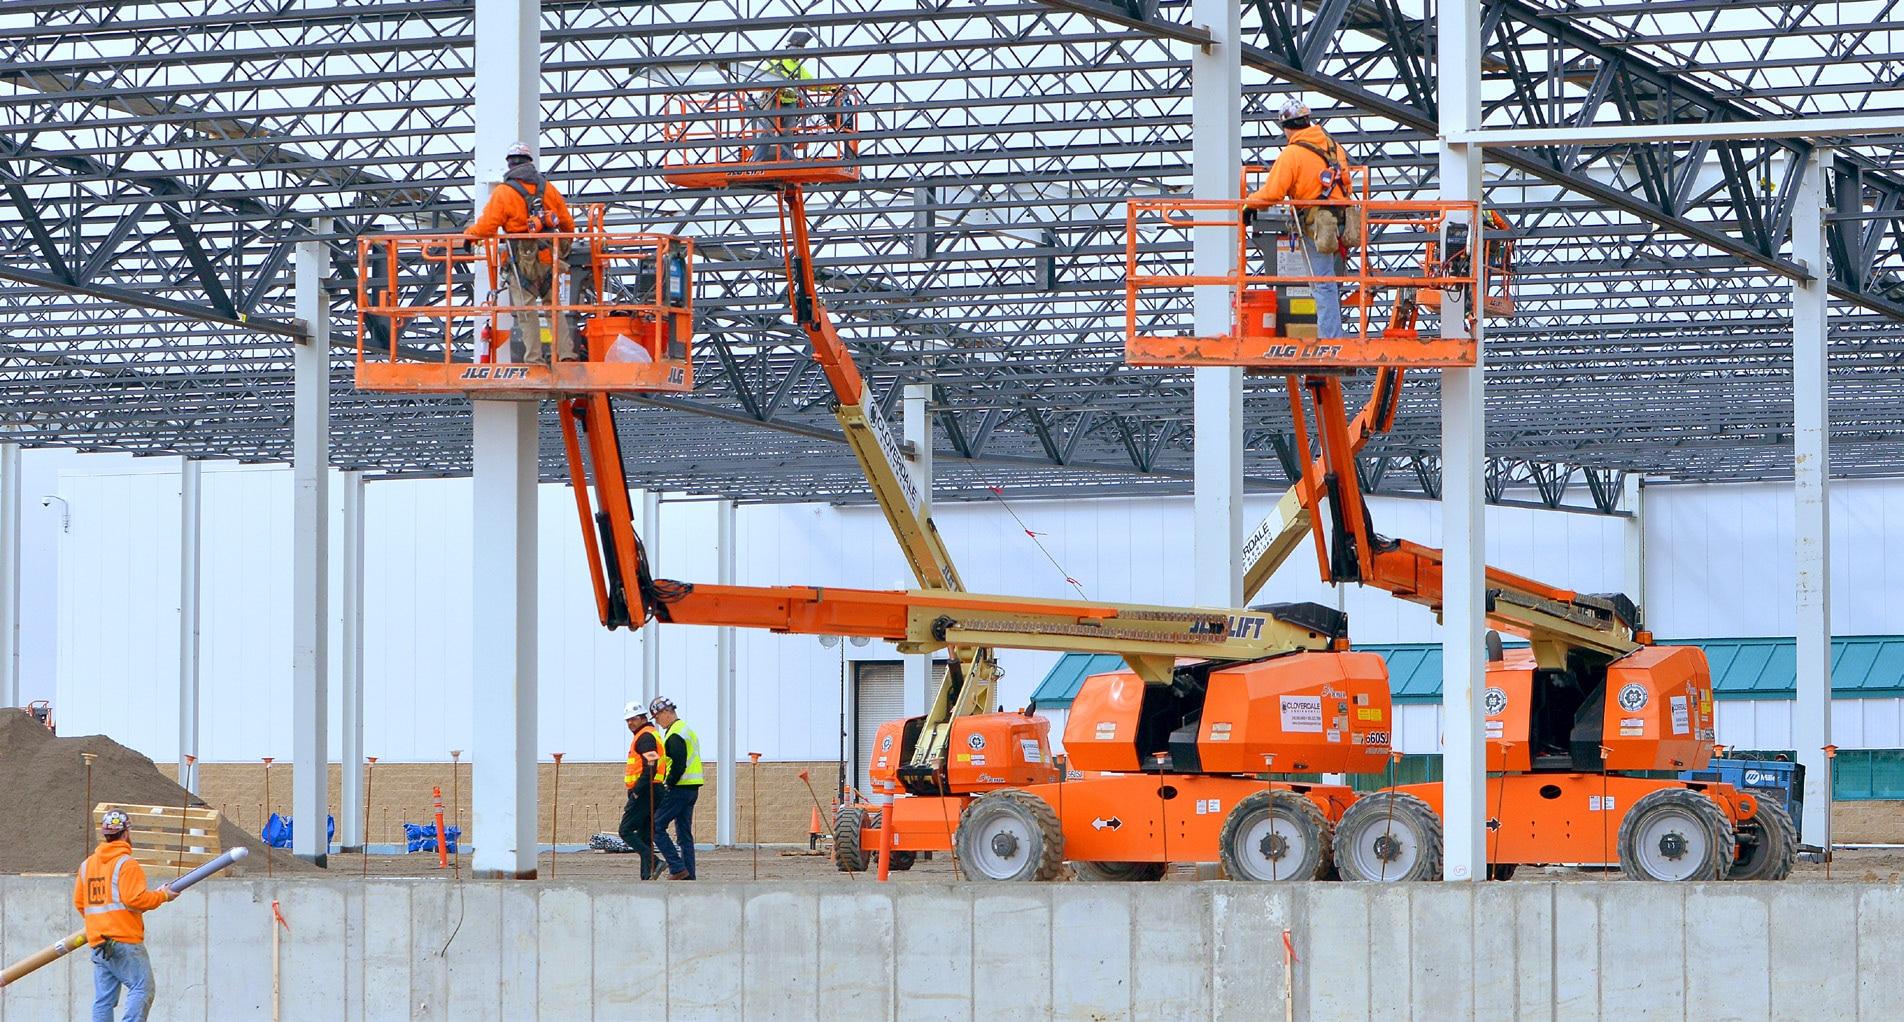 construction men on orange skyjacks